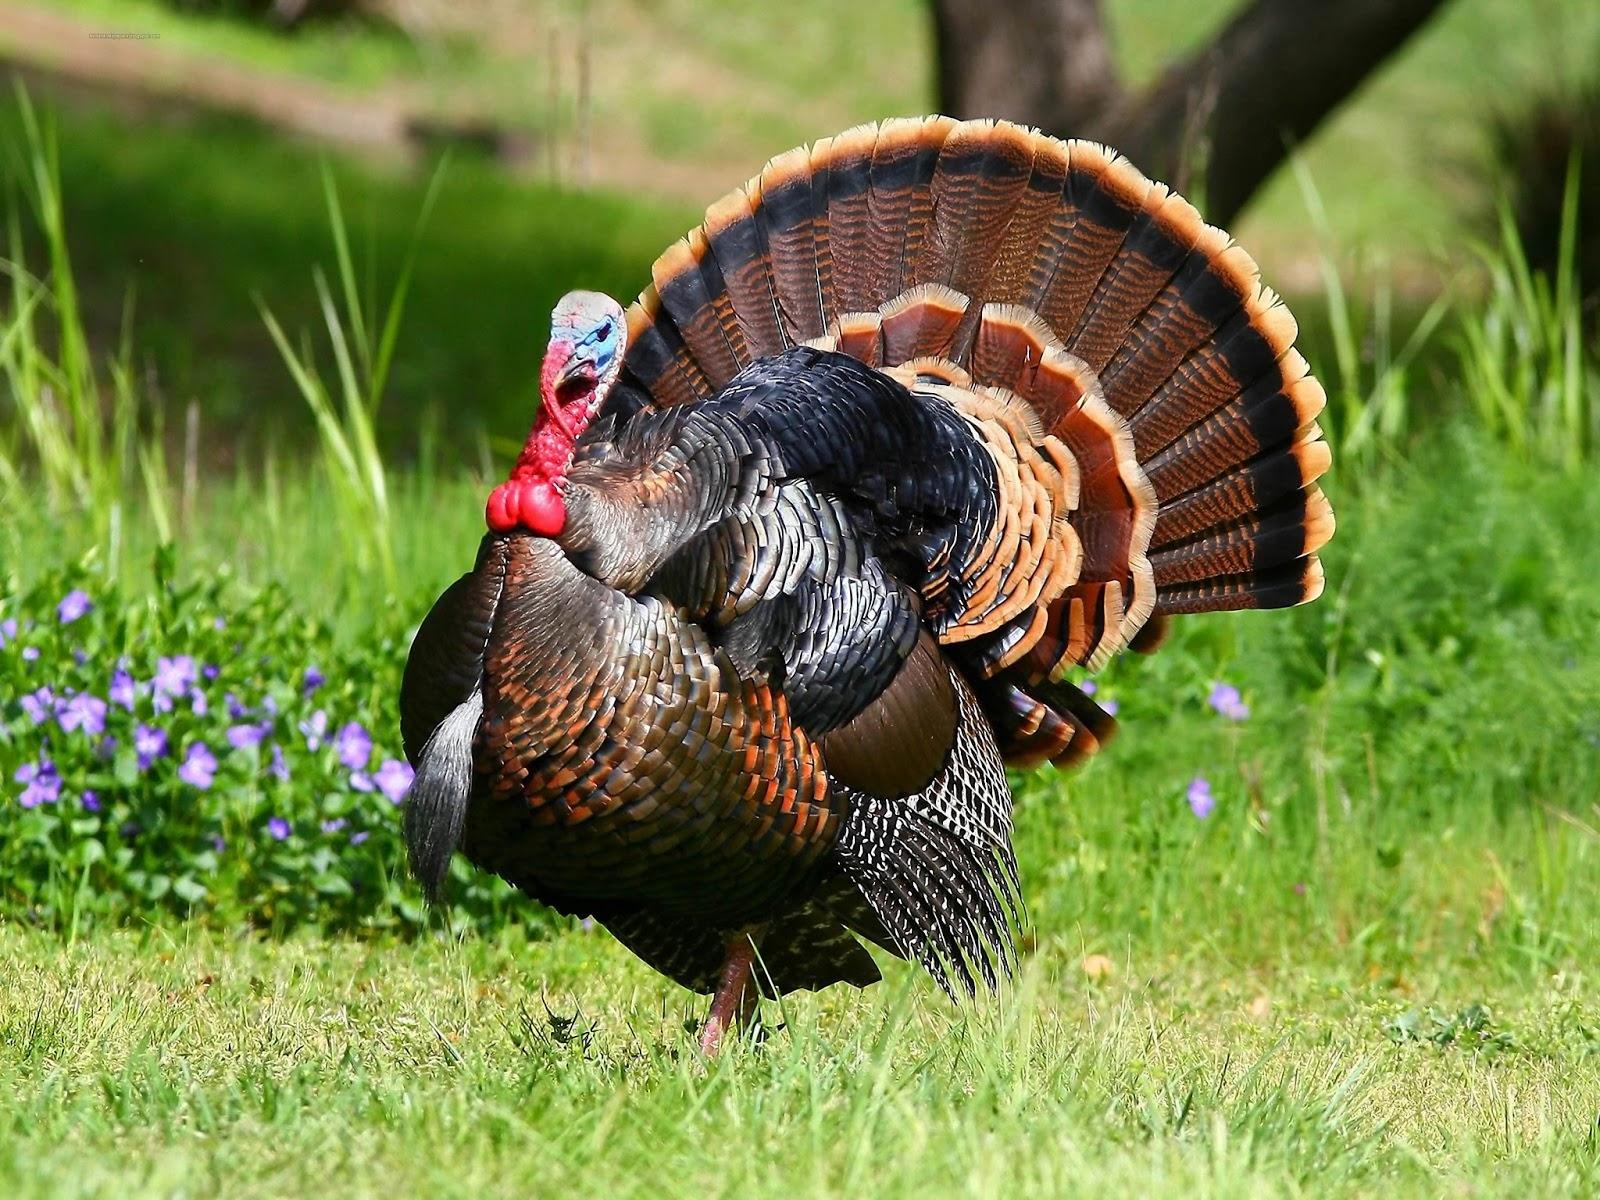 alex norie gasketch blog Turkey bird wallpapers hd 1600x1200